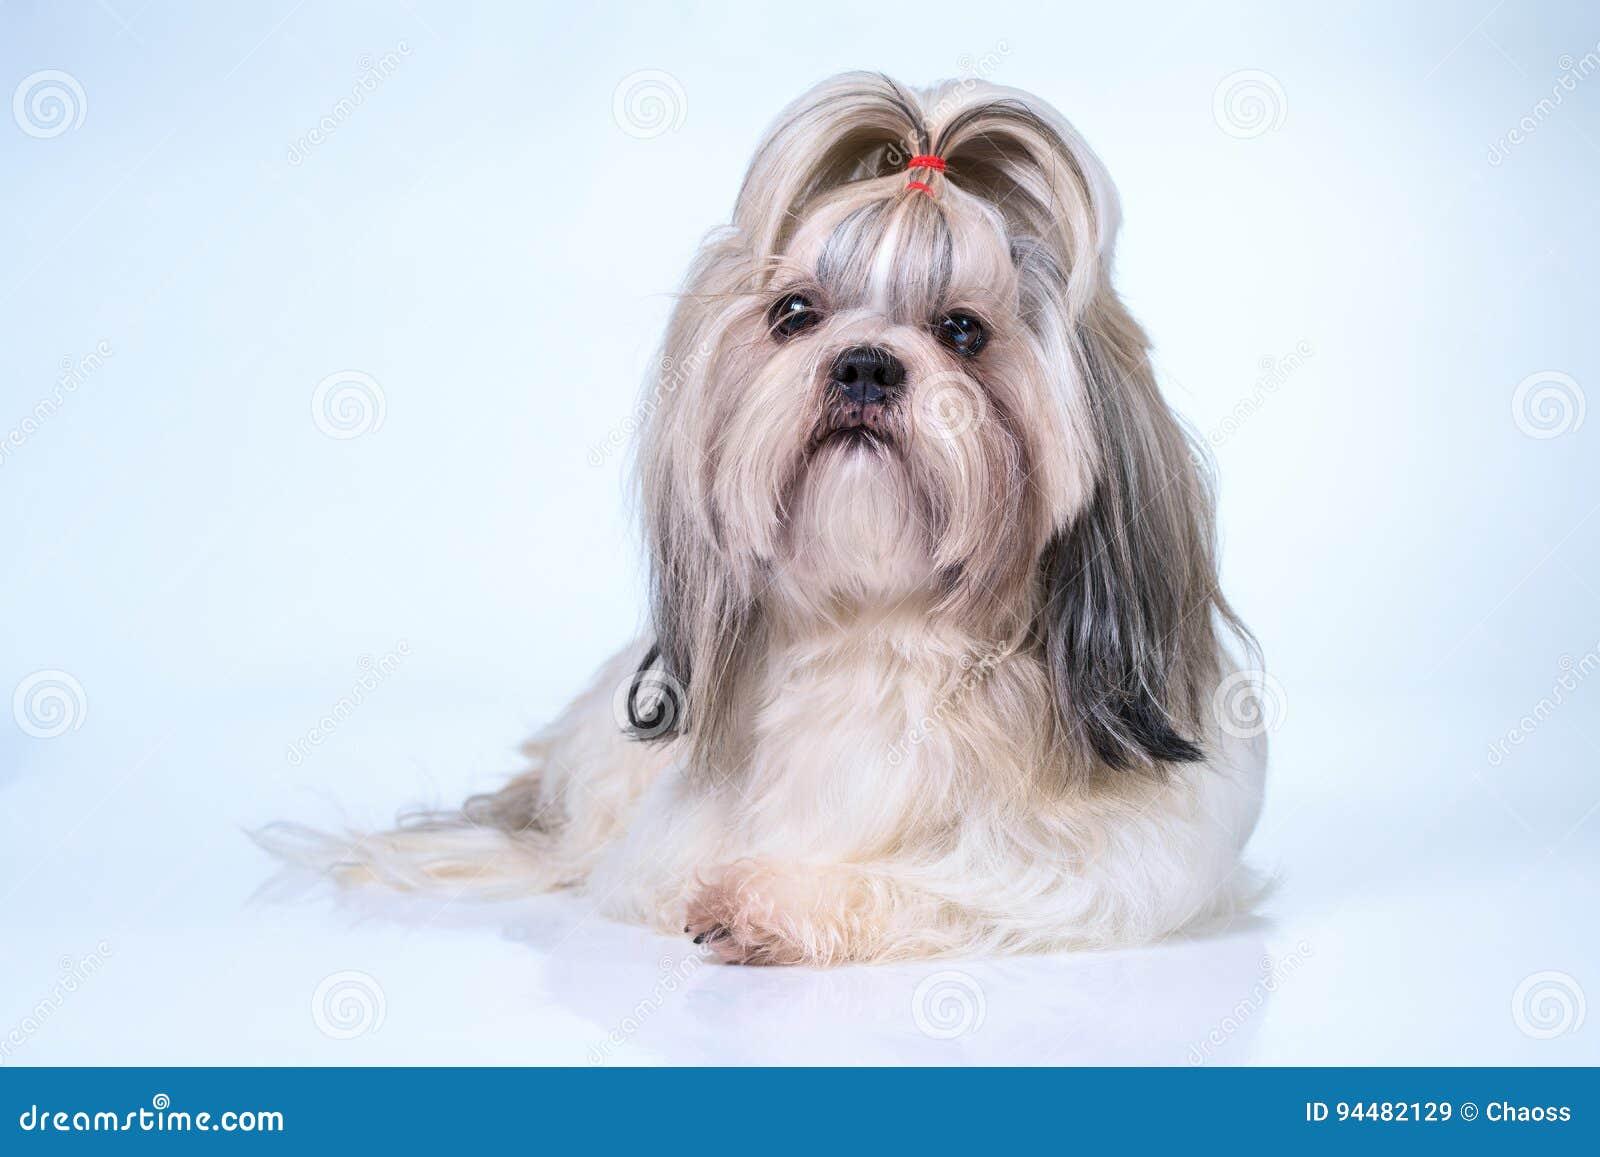 Shih Tzu Dog Stock Image Image Of Bright Domestic Long 94482129